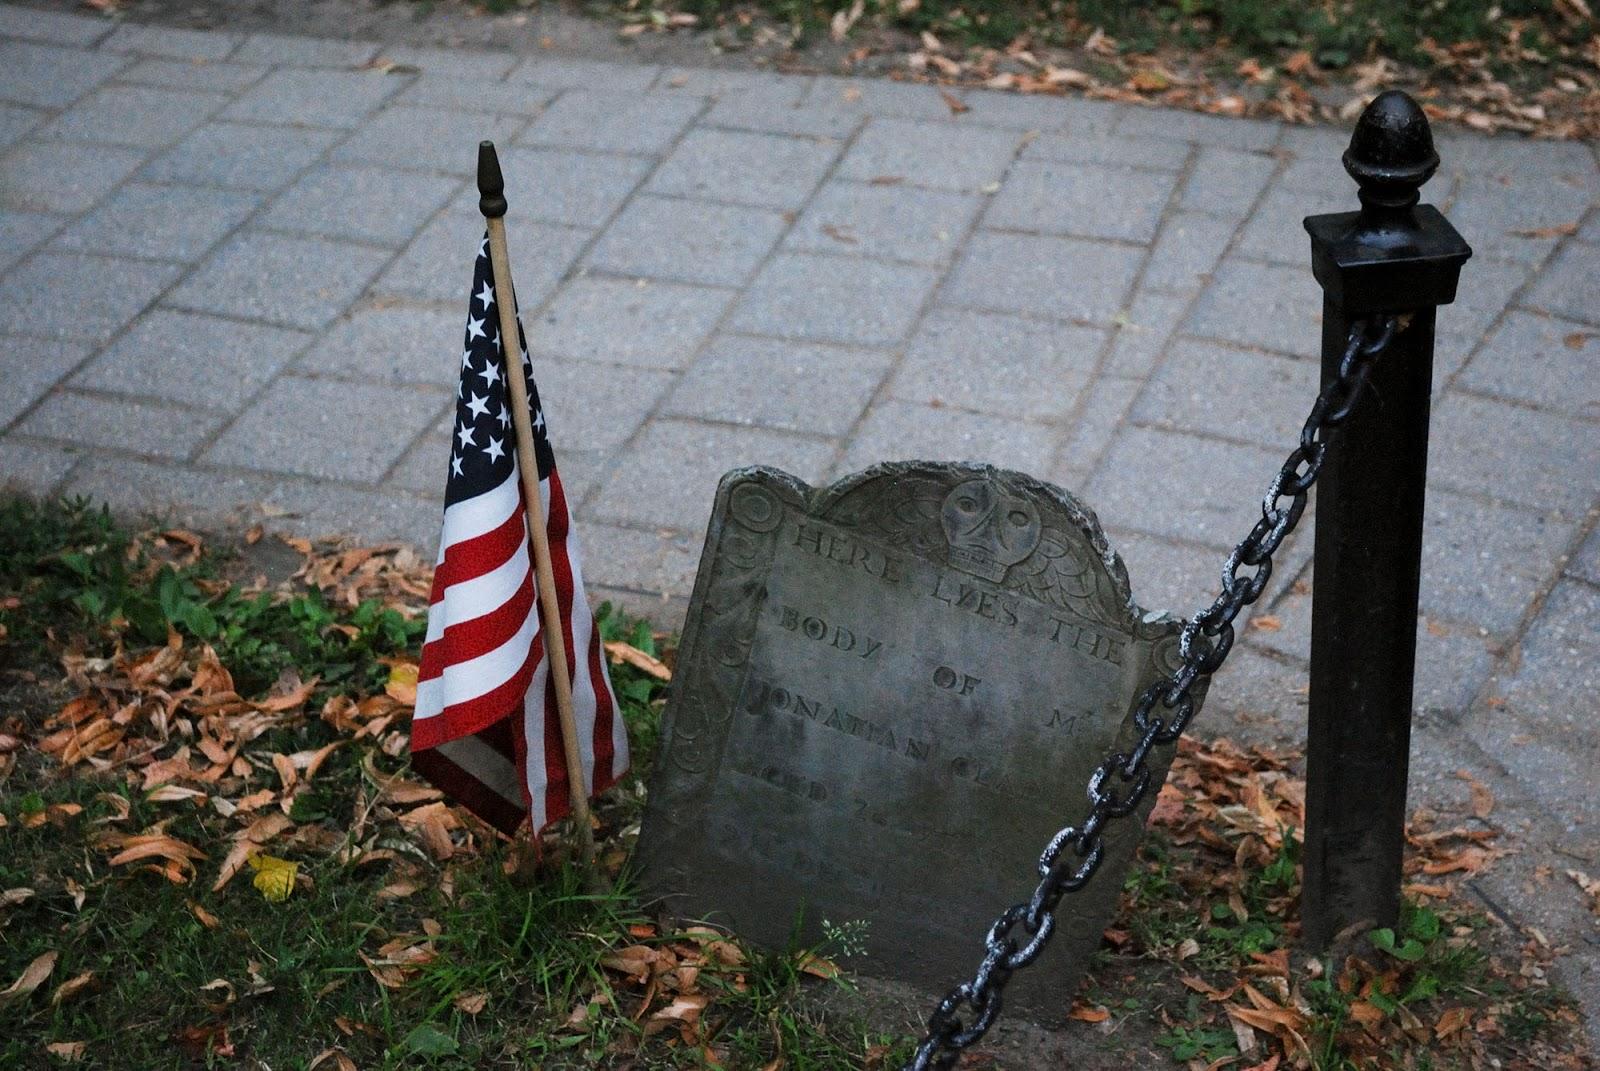 granary burying ground freedom trail map boston itinerary plan guide tourism usa america park east coast